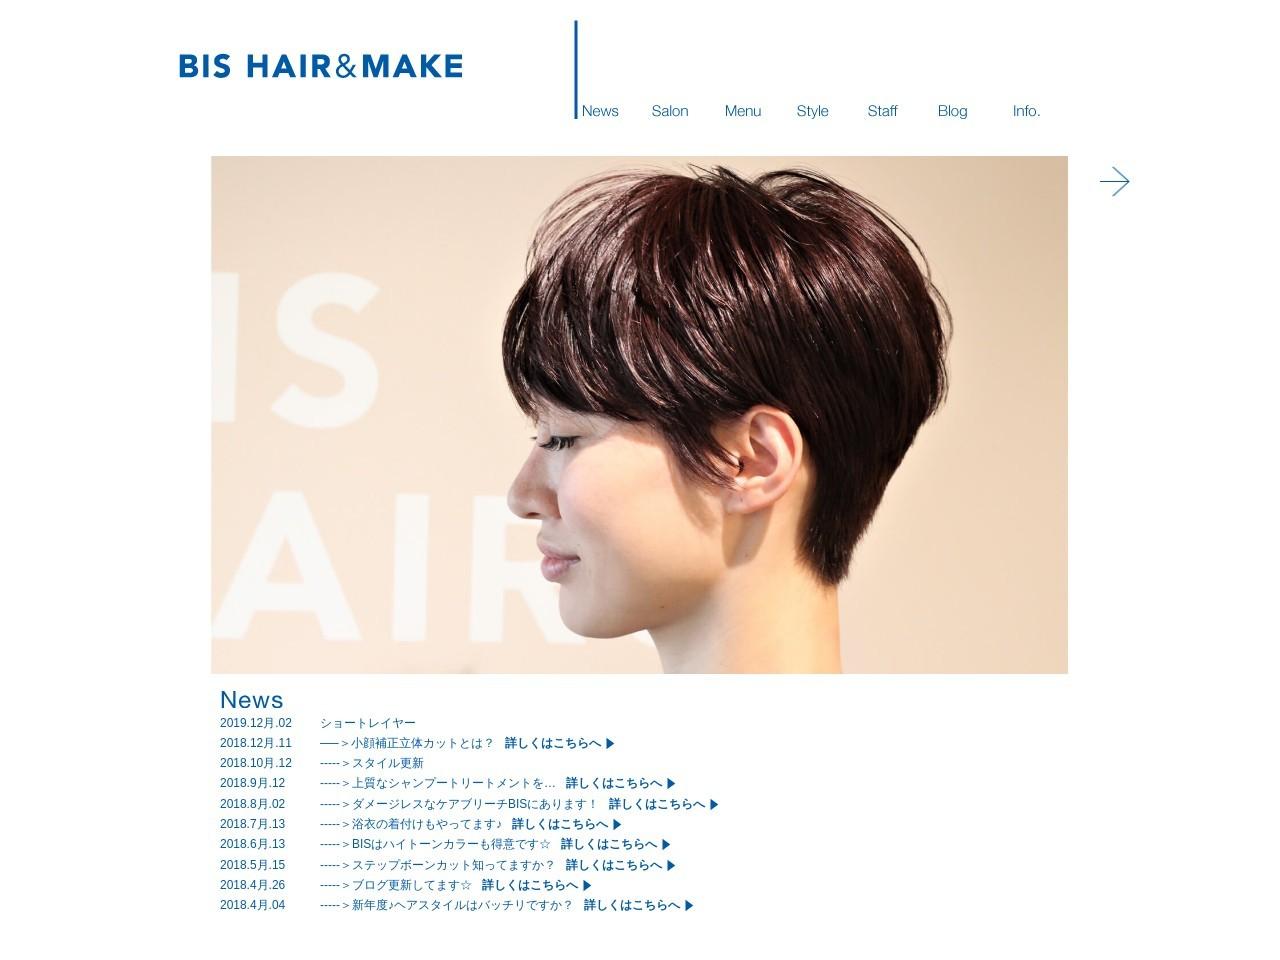 BIS hair&make ビスヘアアンドメイク